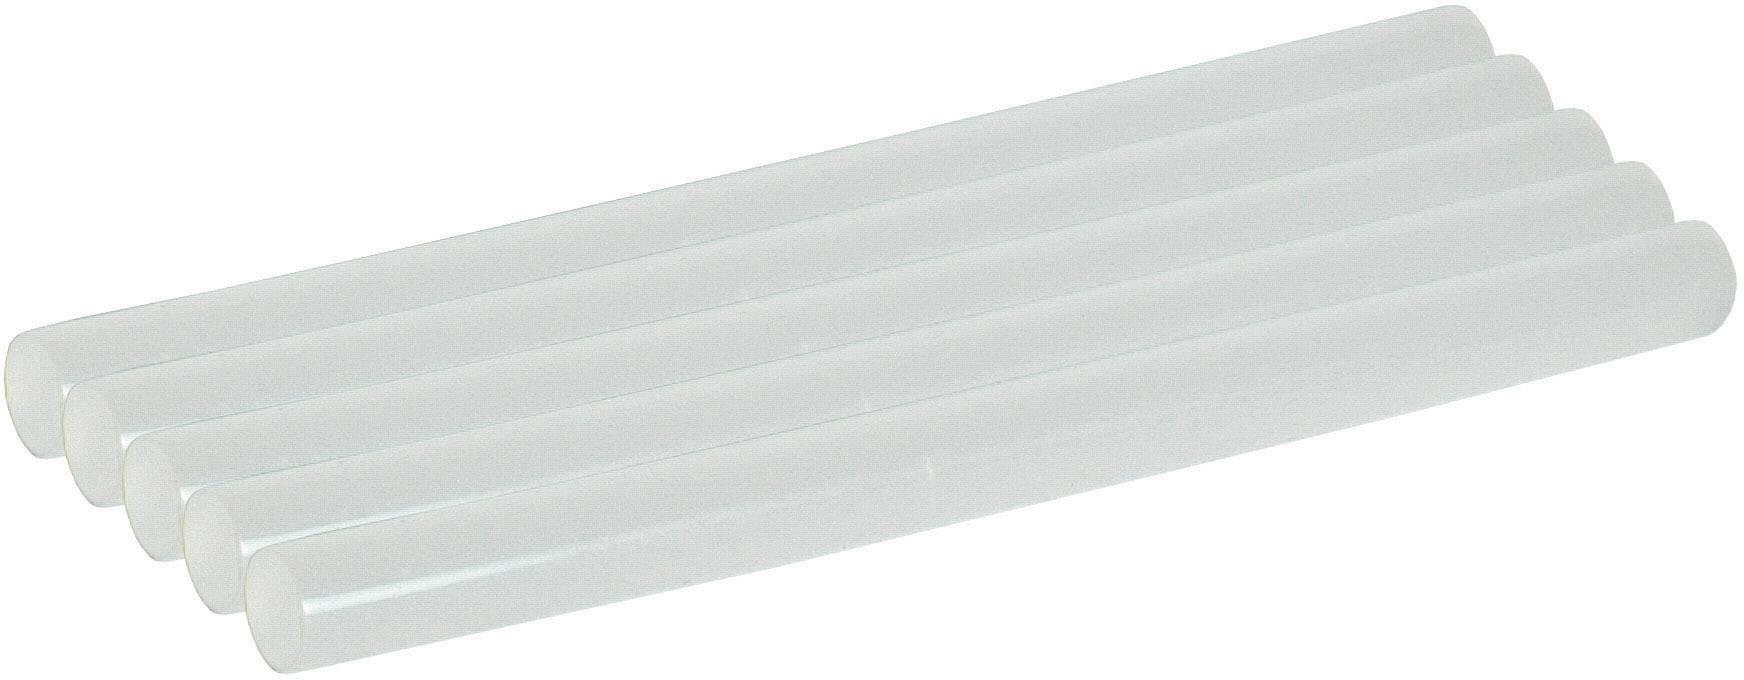 Lepiace tyčinky Star Tec ST 10642, Ø 7 mm, délka 100 mm, 5 ks, transparentná biela